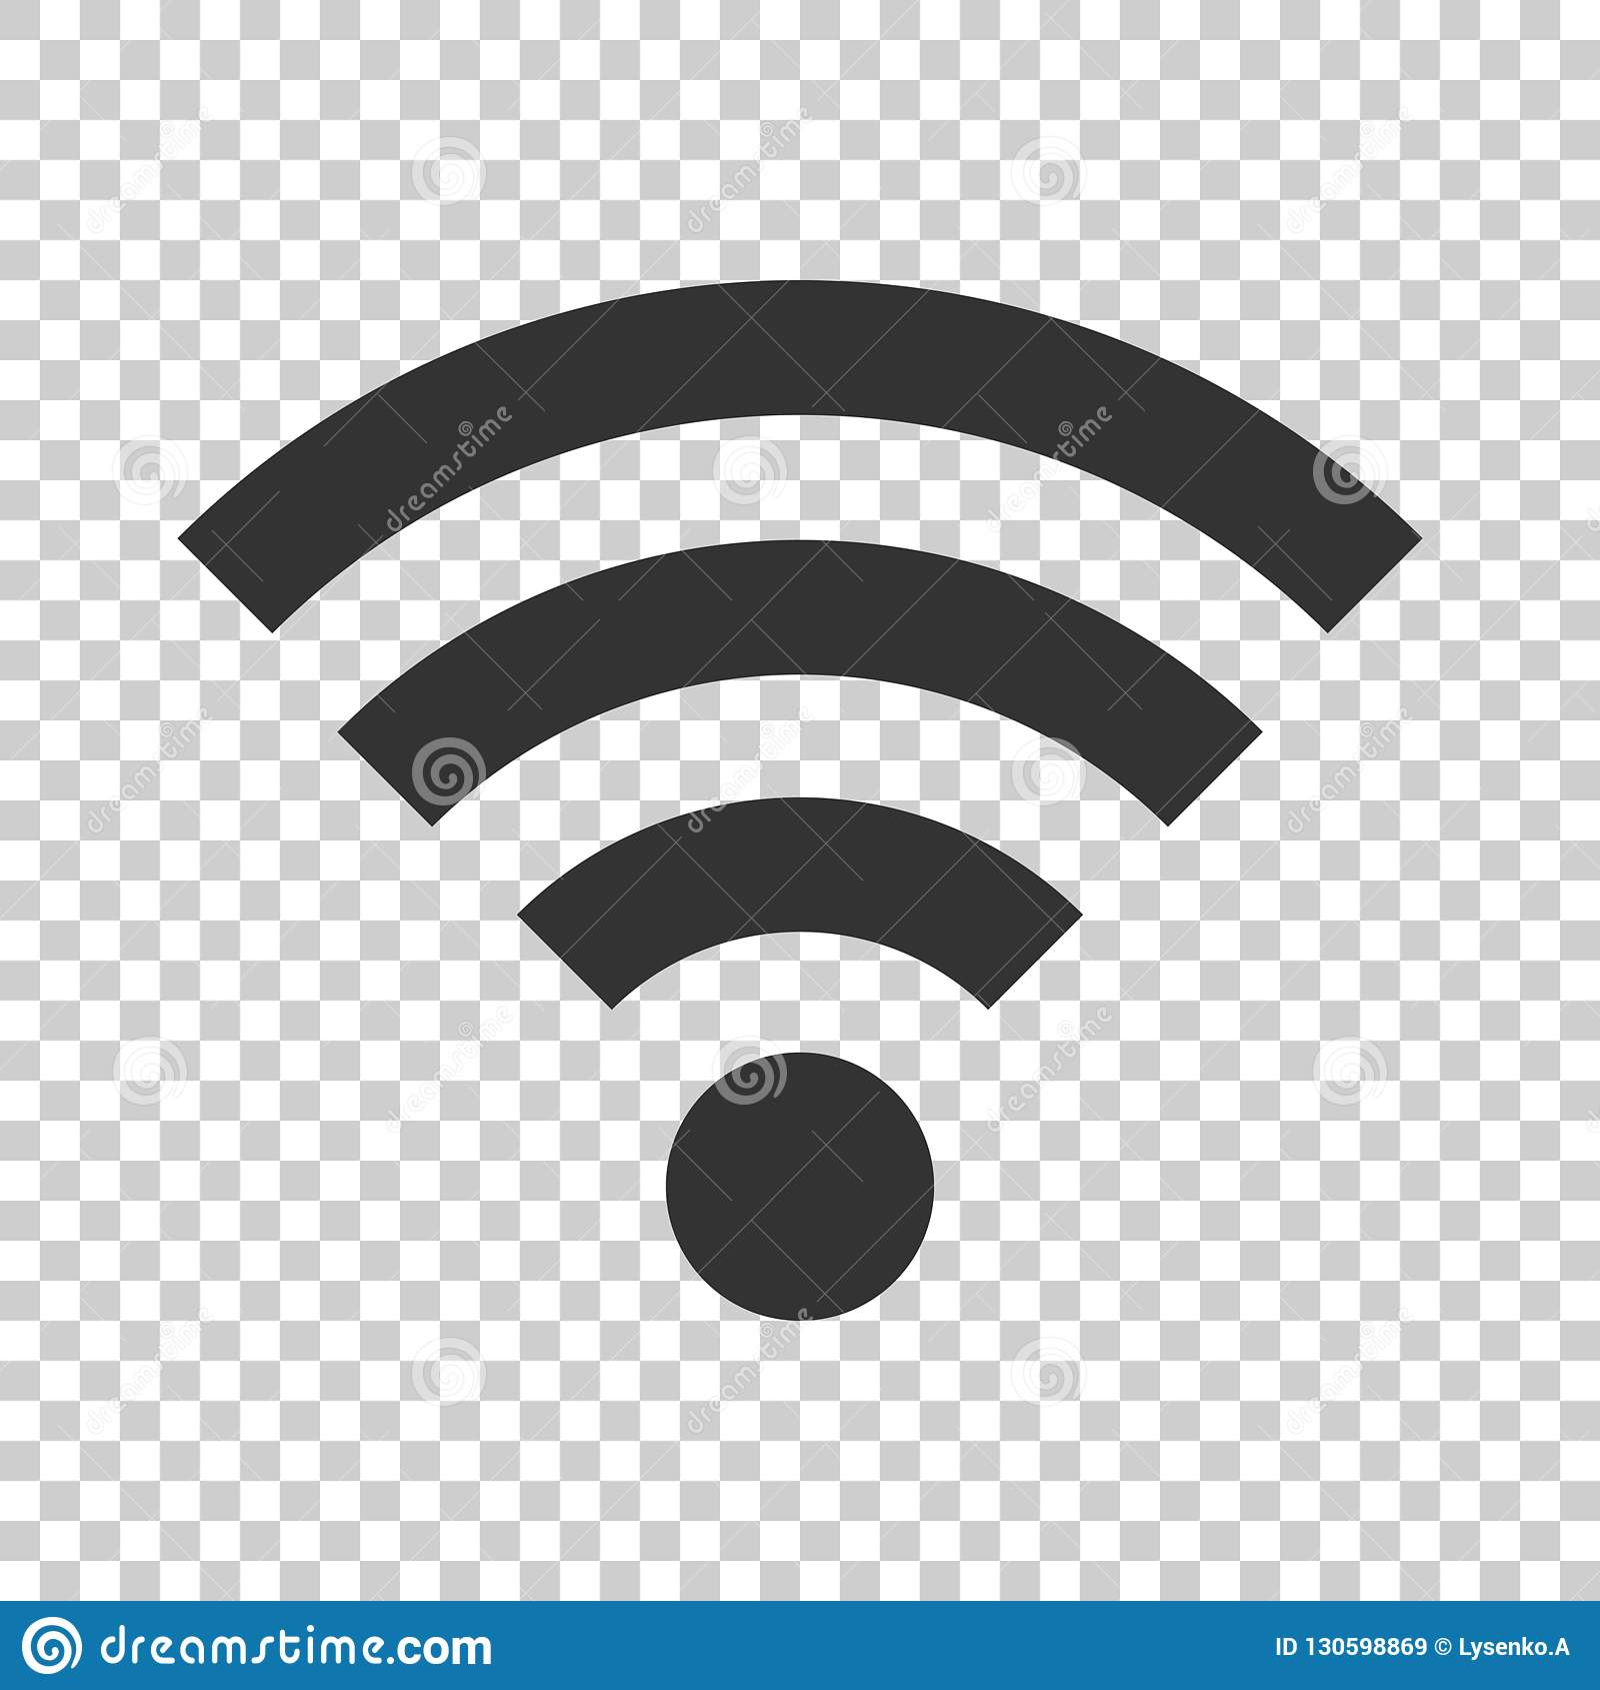 Wifi internet sign icon in flat style. Wi-fi wireless technology